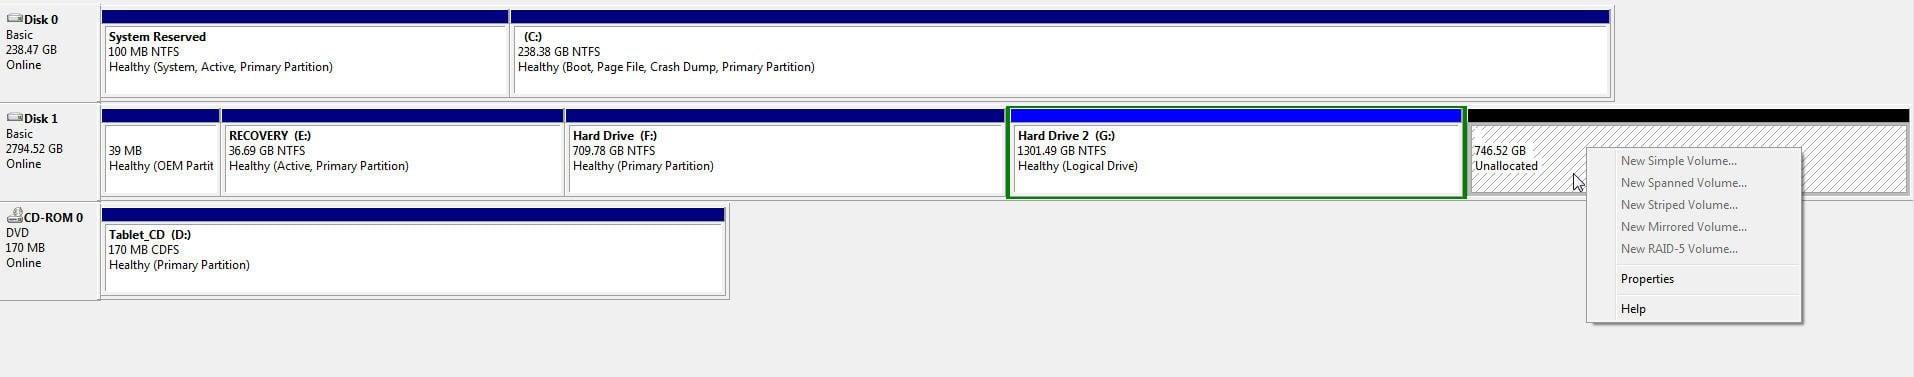 3TB Hard Drive